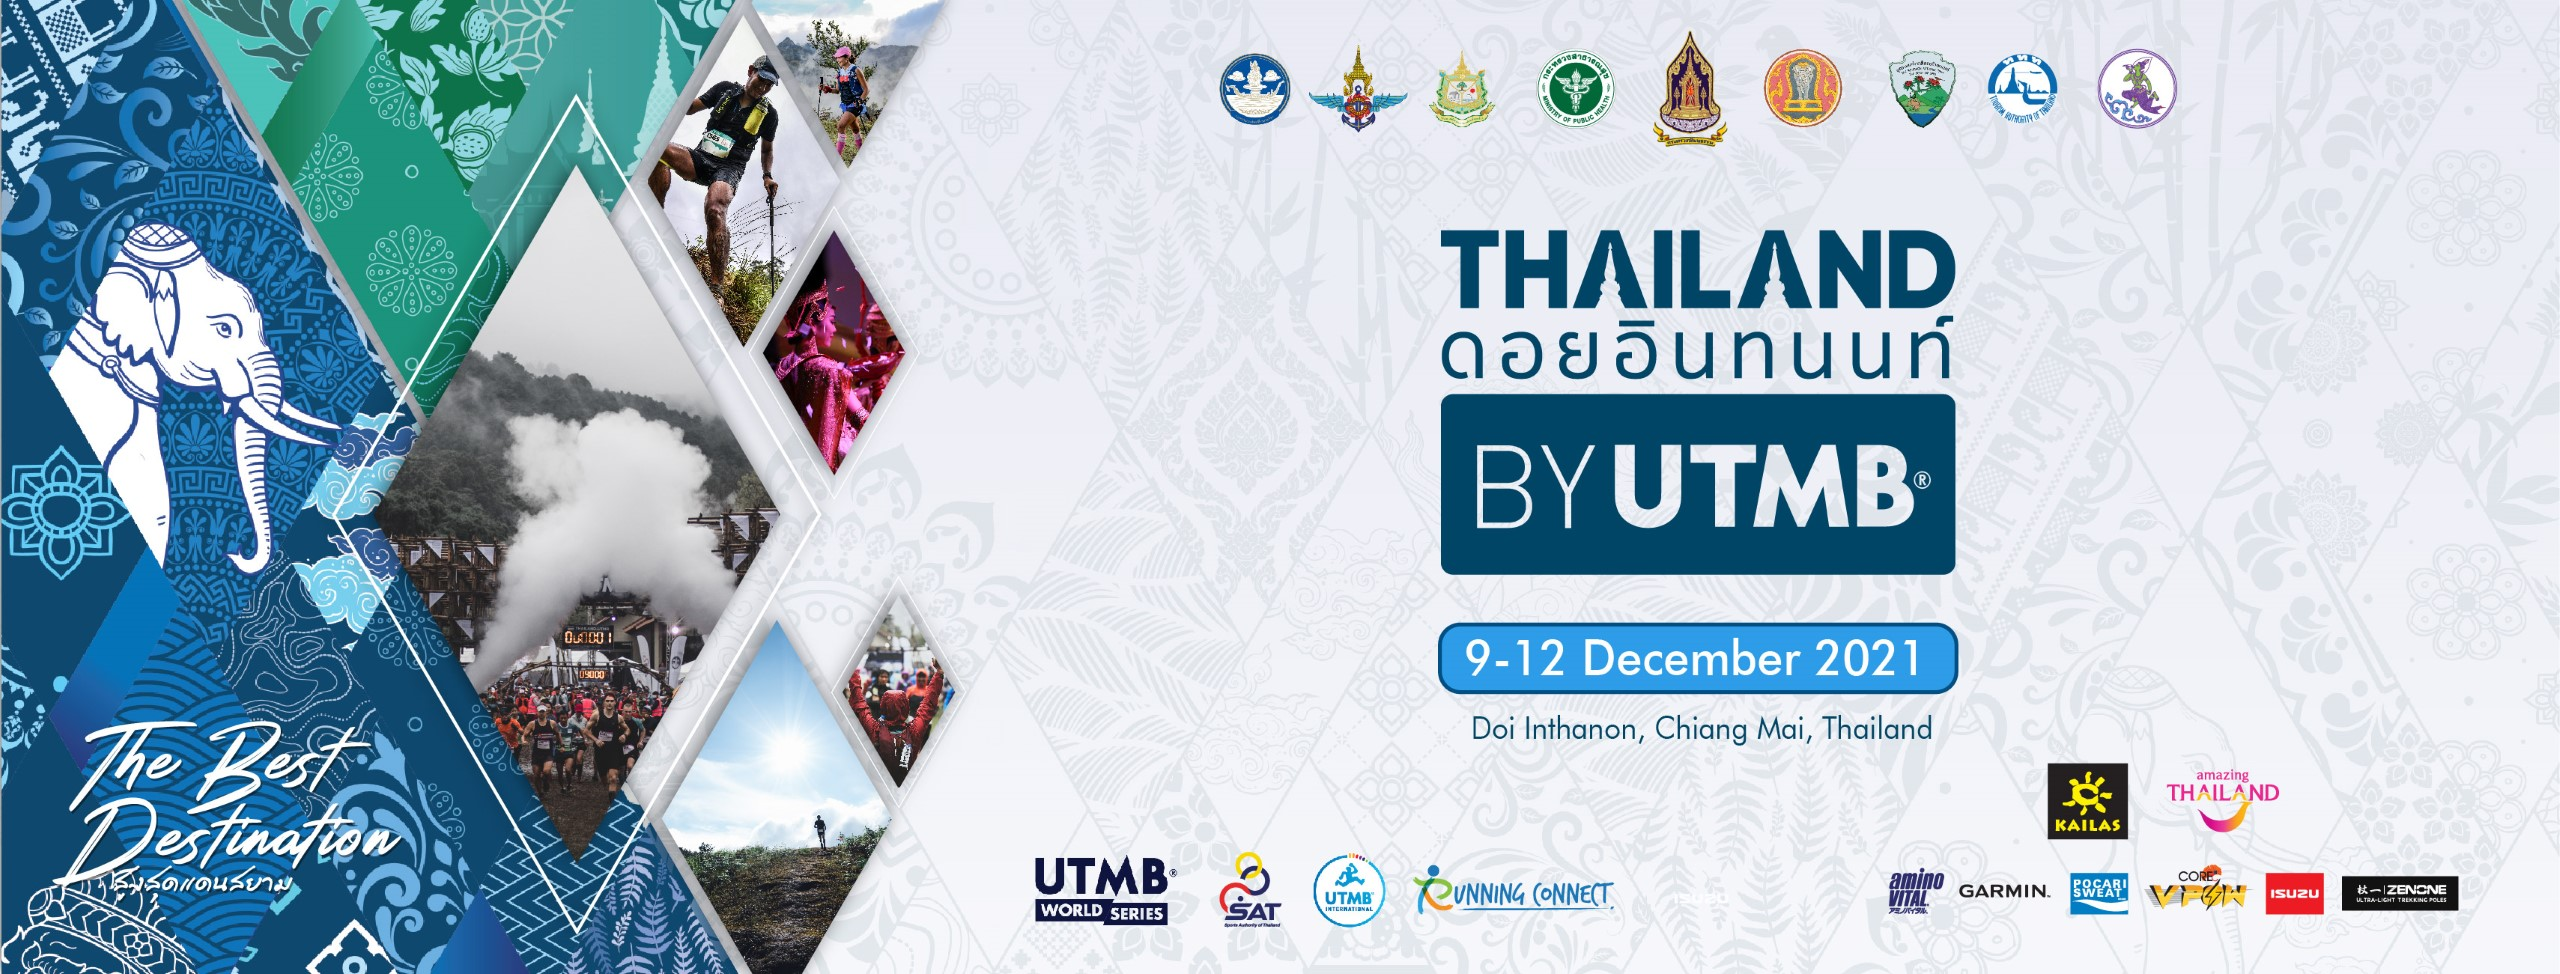 Thailand by UTMB 2021